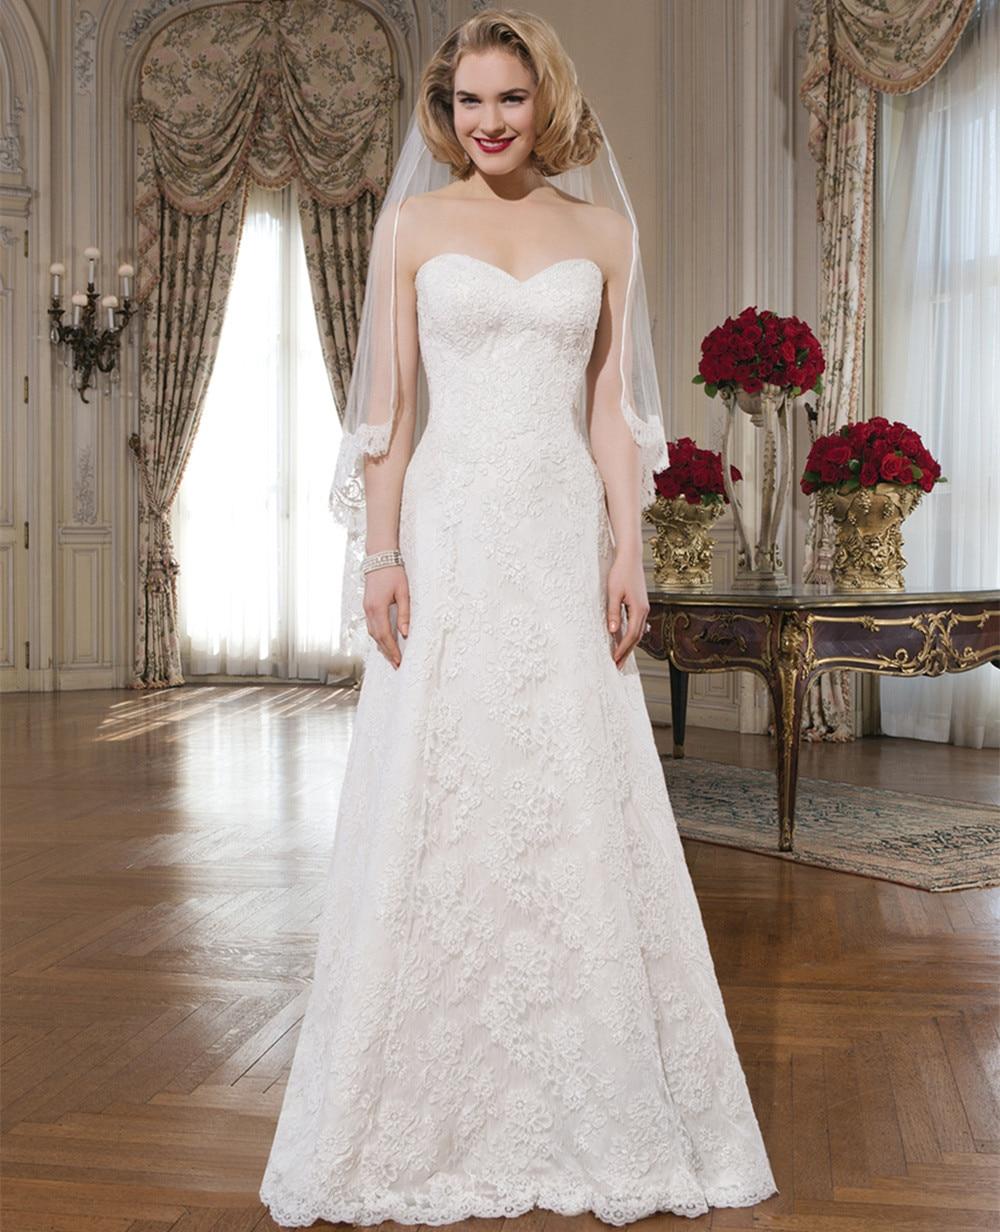 Elegant Long Romantic Lace Wedding Dress With Long Train